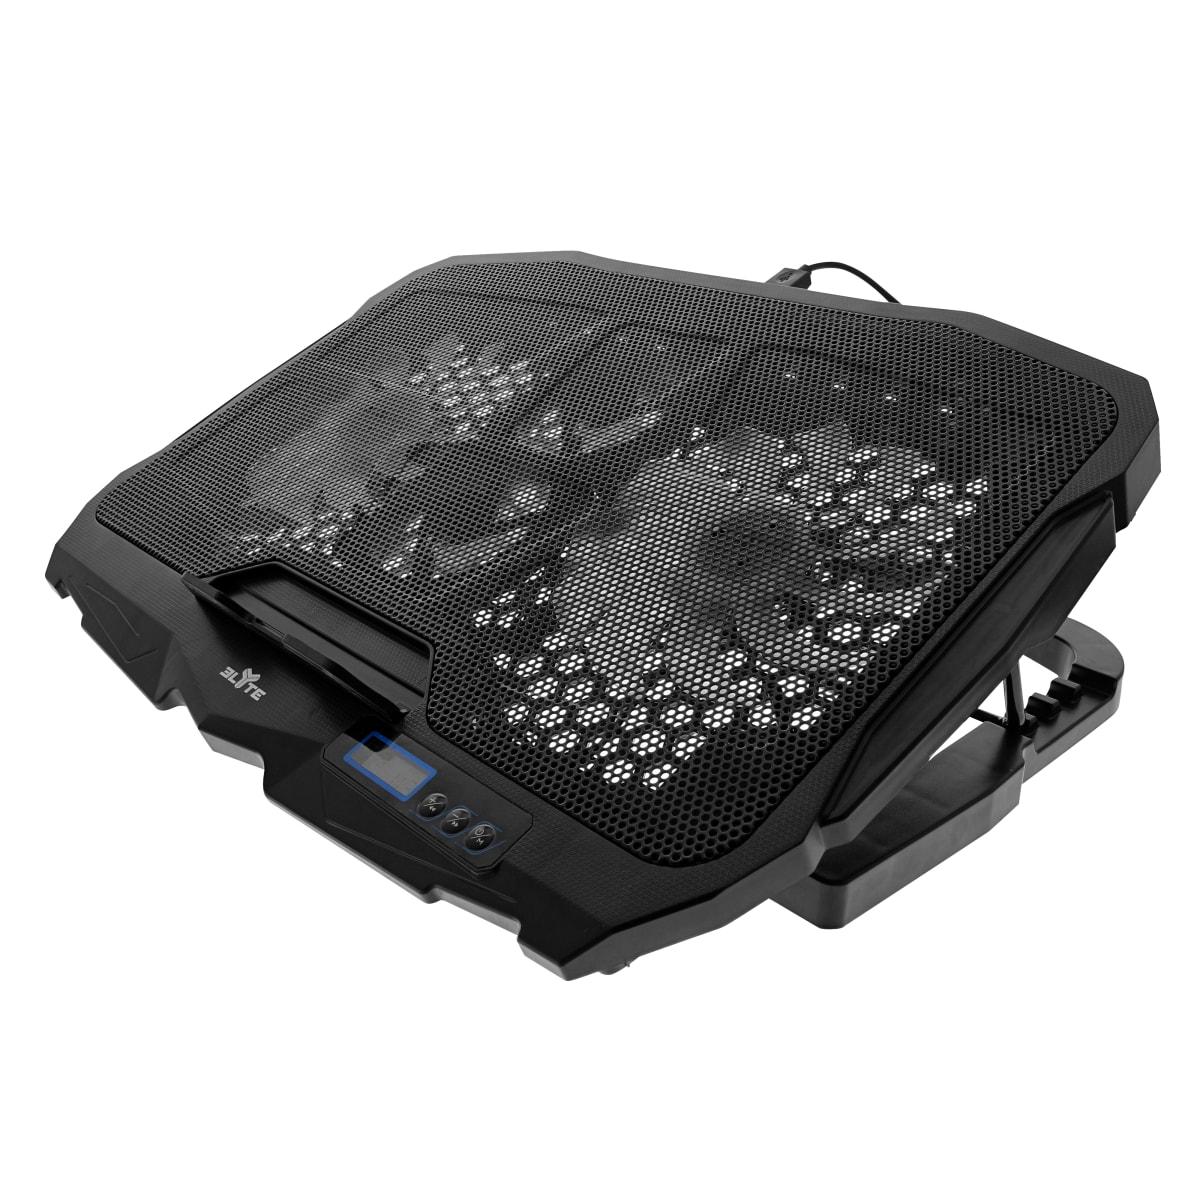 Gaming cooling pad